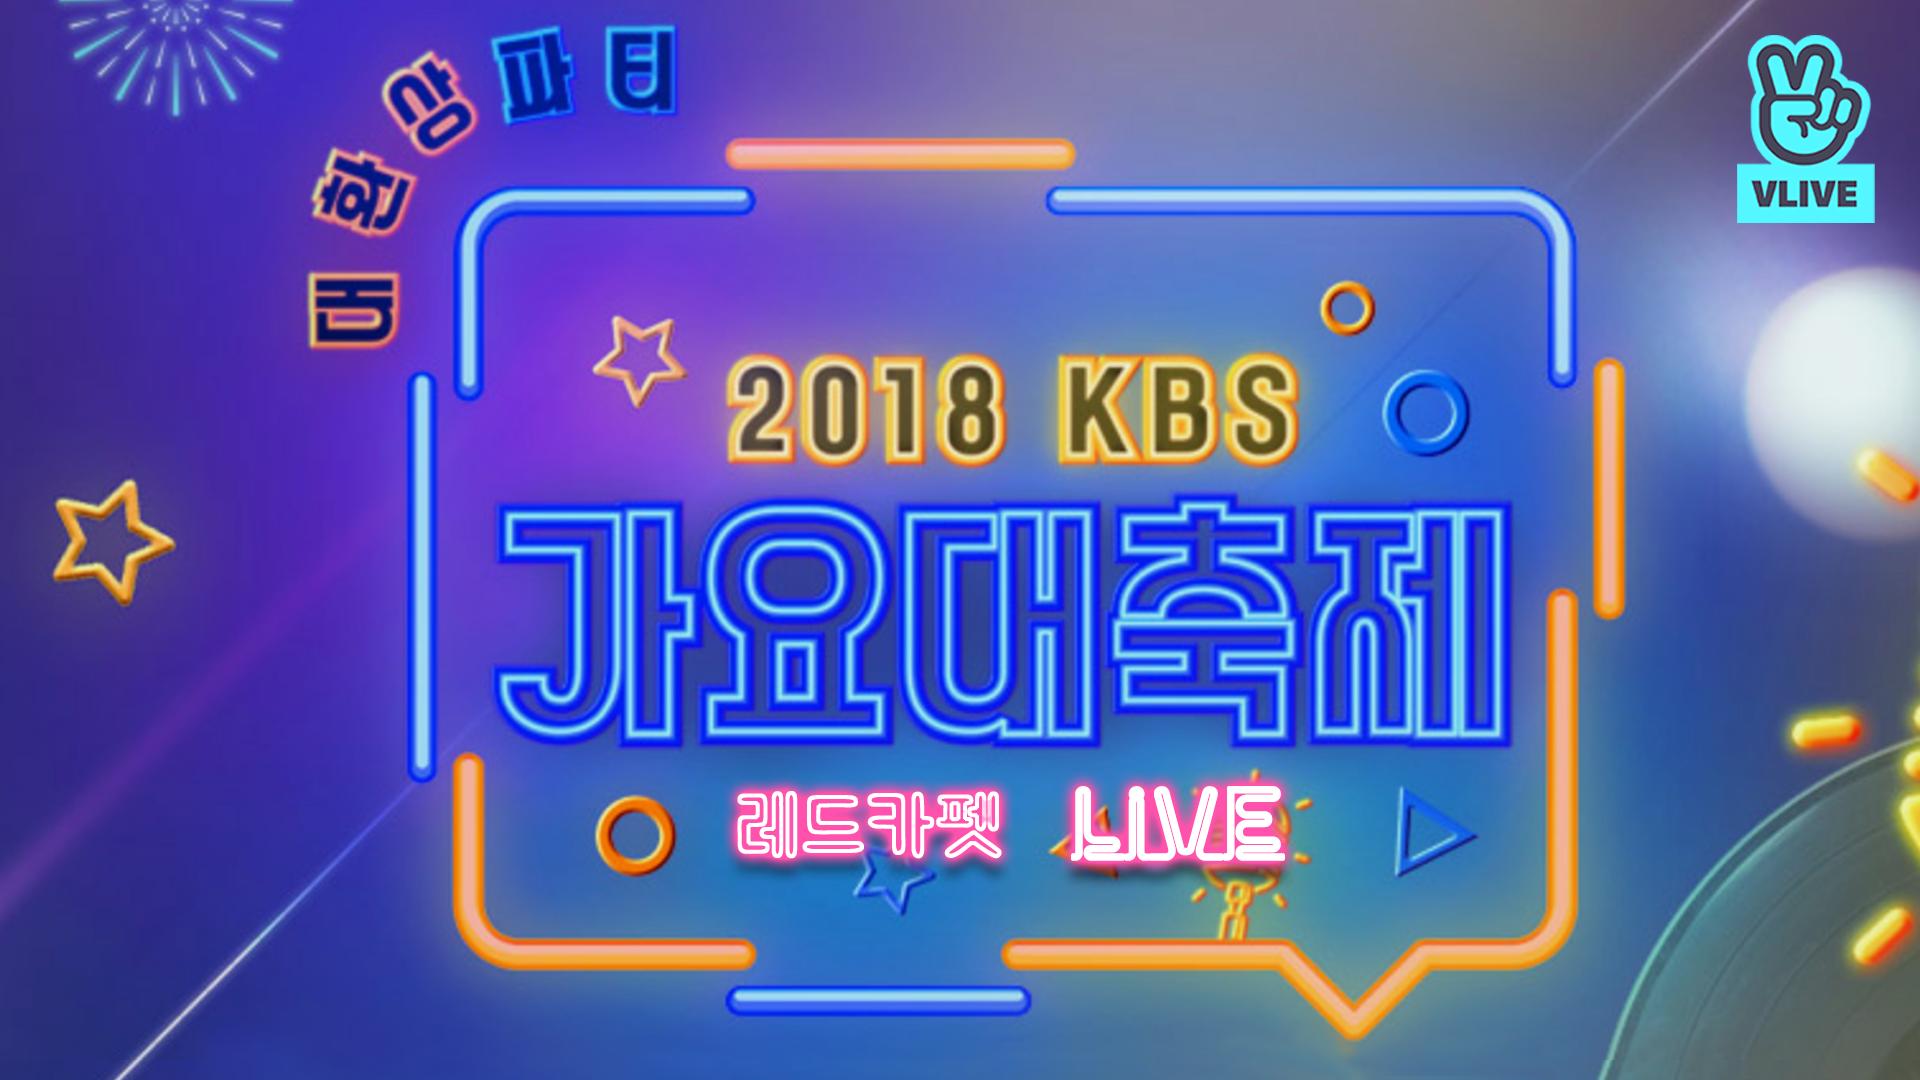 2018 KBS 가요대축제 레드카펫 생중계 / 2018 KBS Song Festival Red Carpet Live